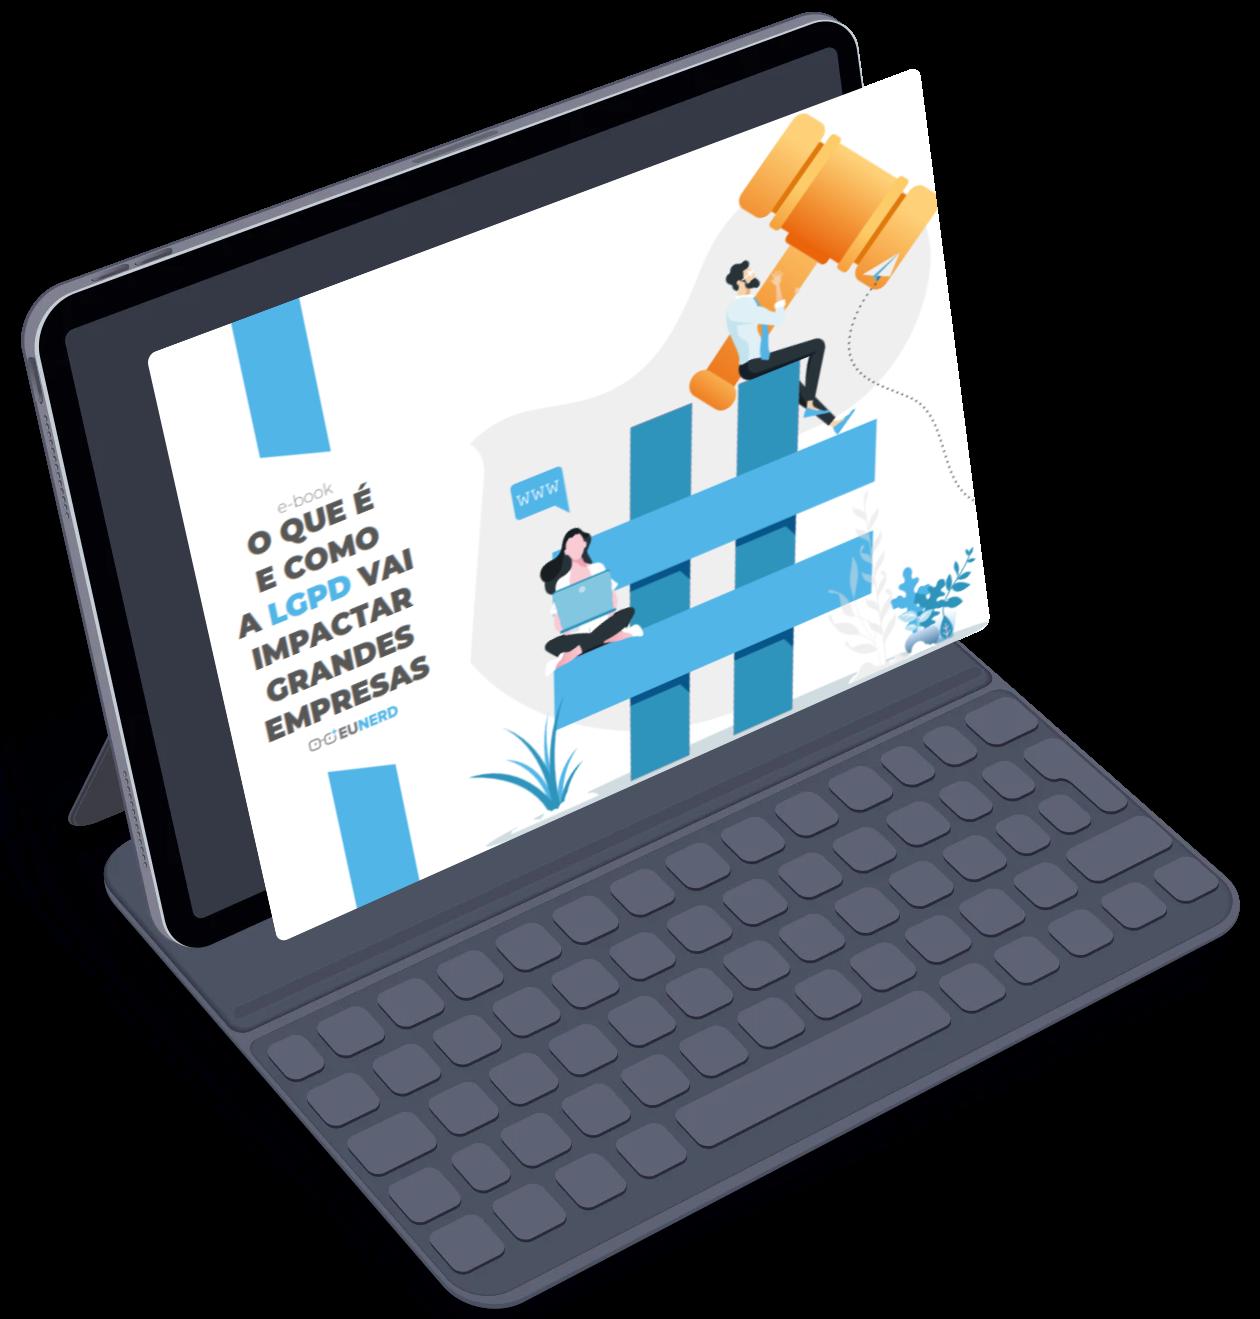 clean-ipad-screen-mockup-with-keyboard-1